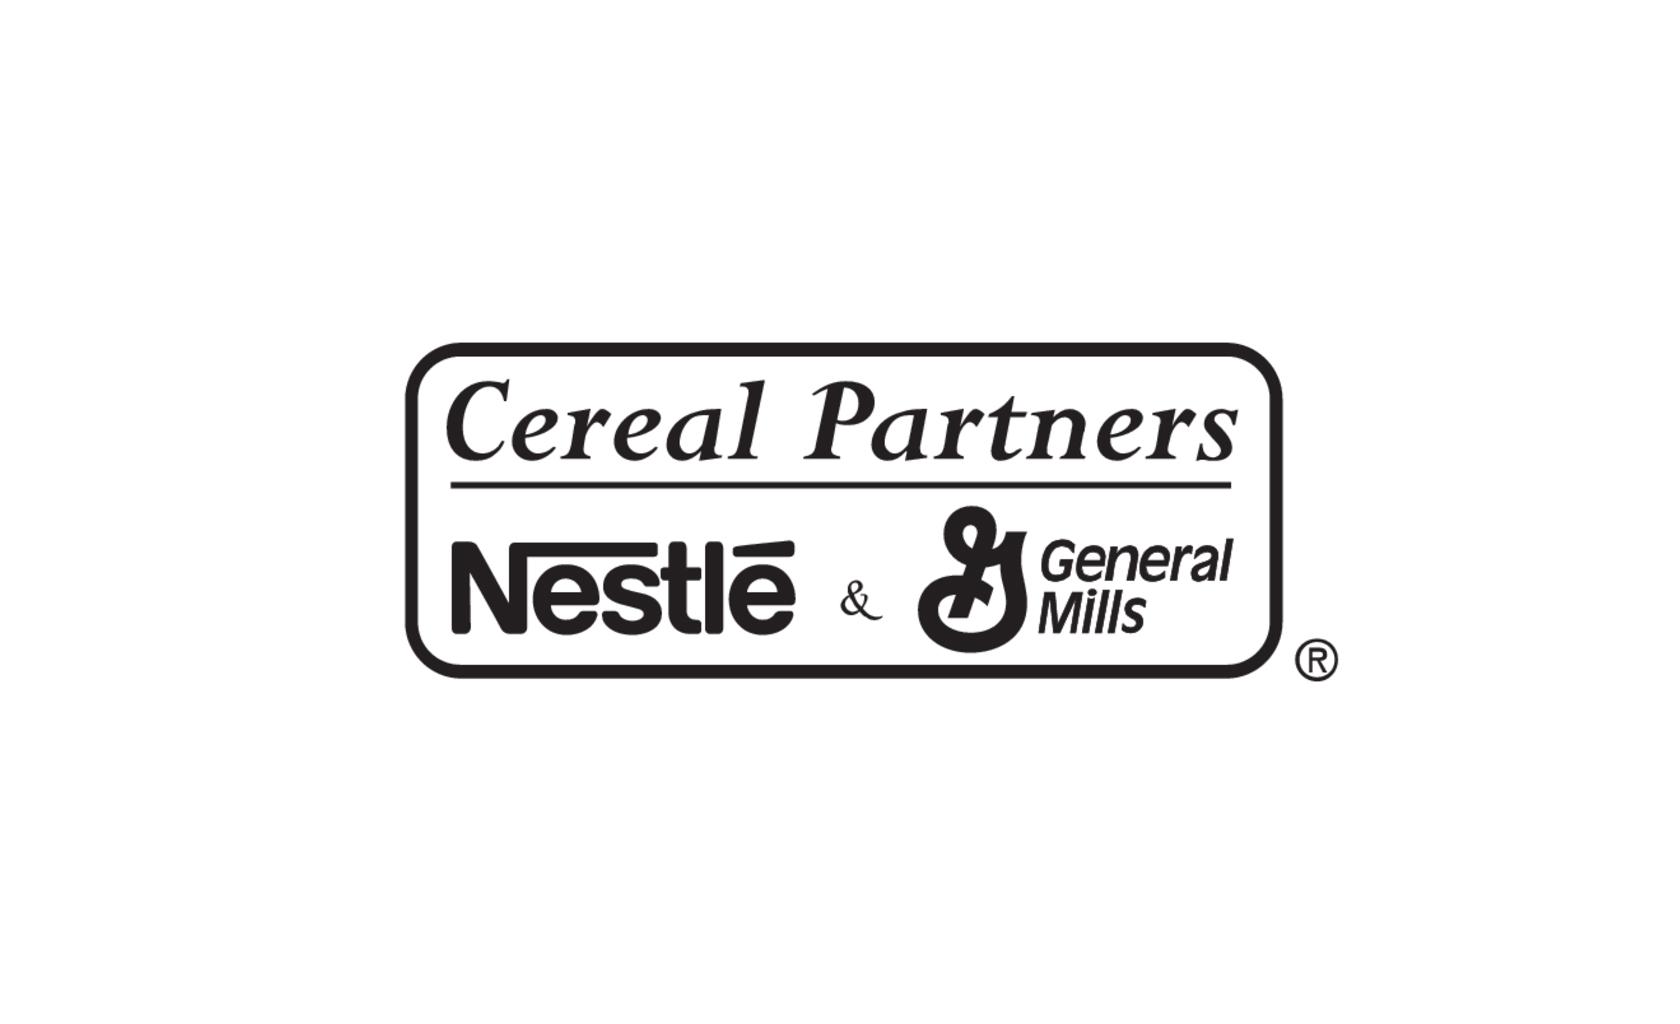 yemek tarifi: cereal partners [12]